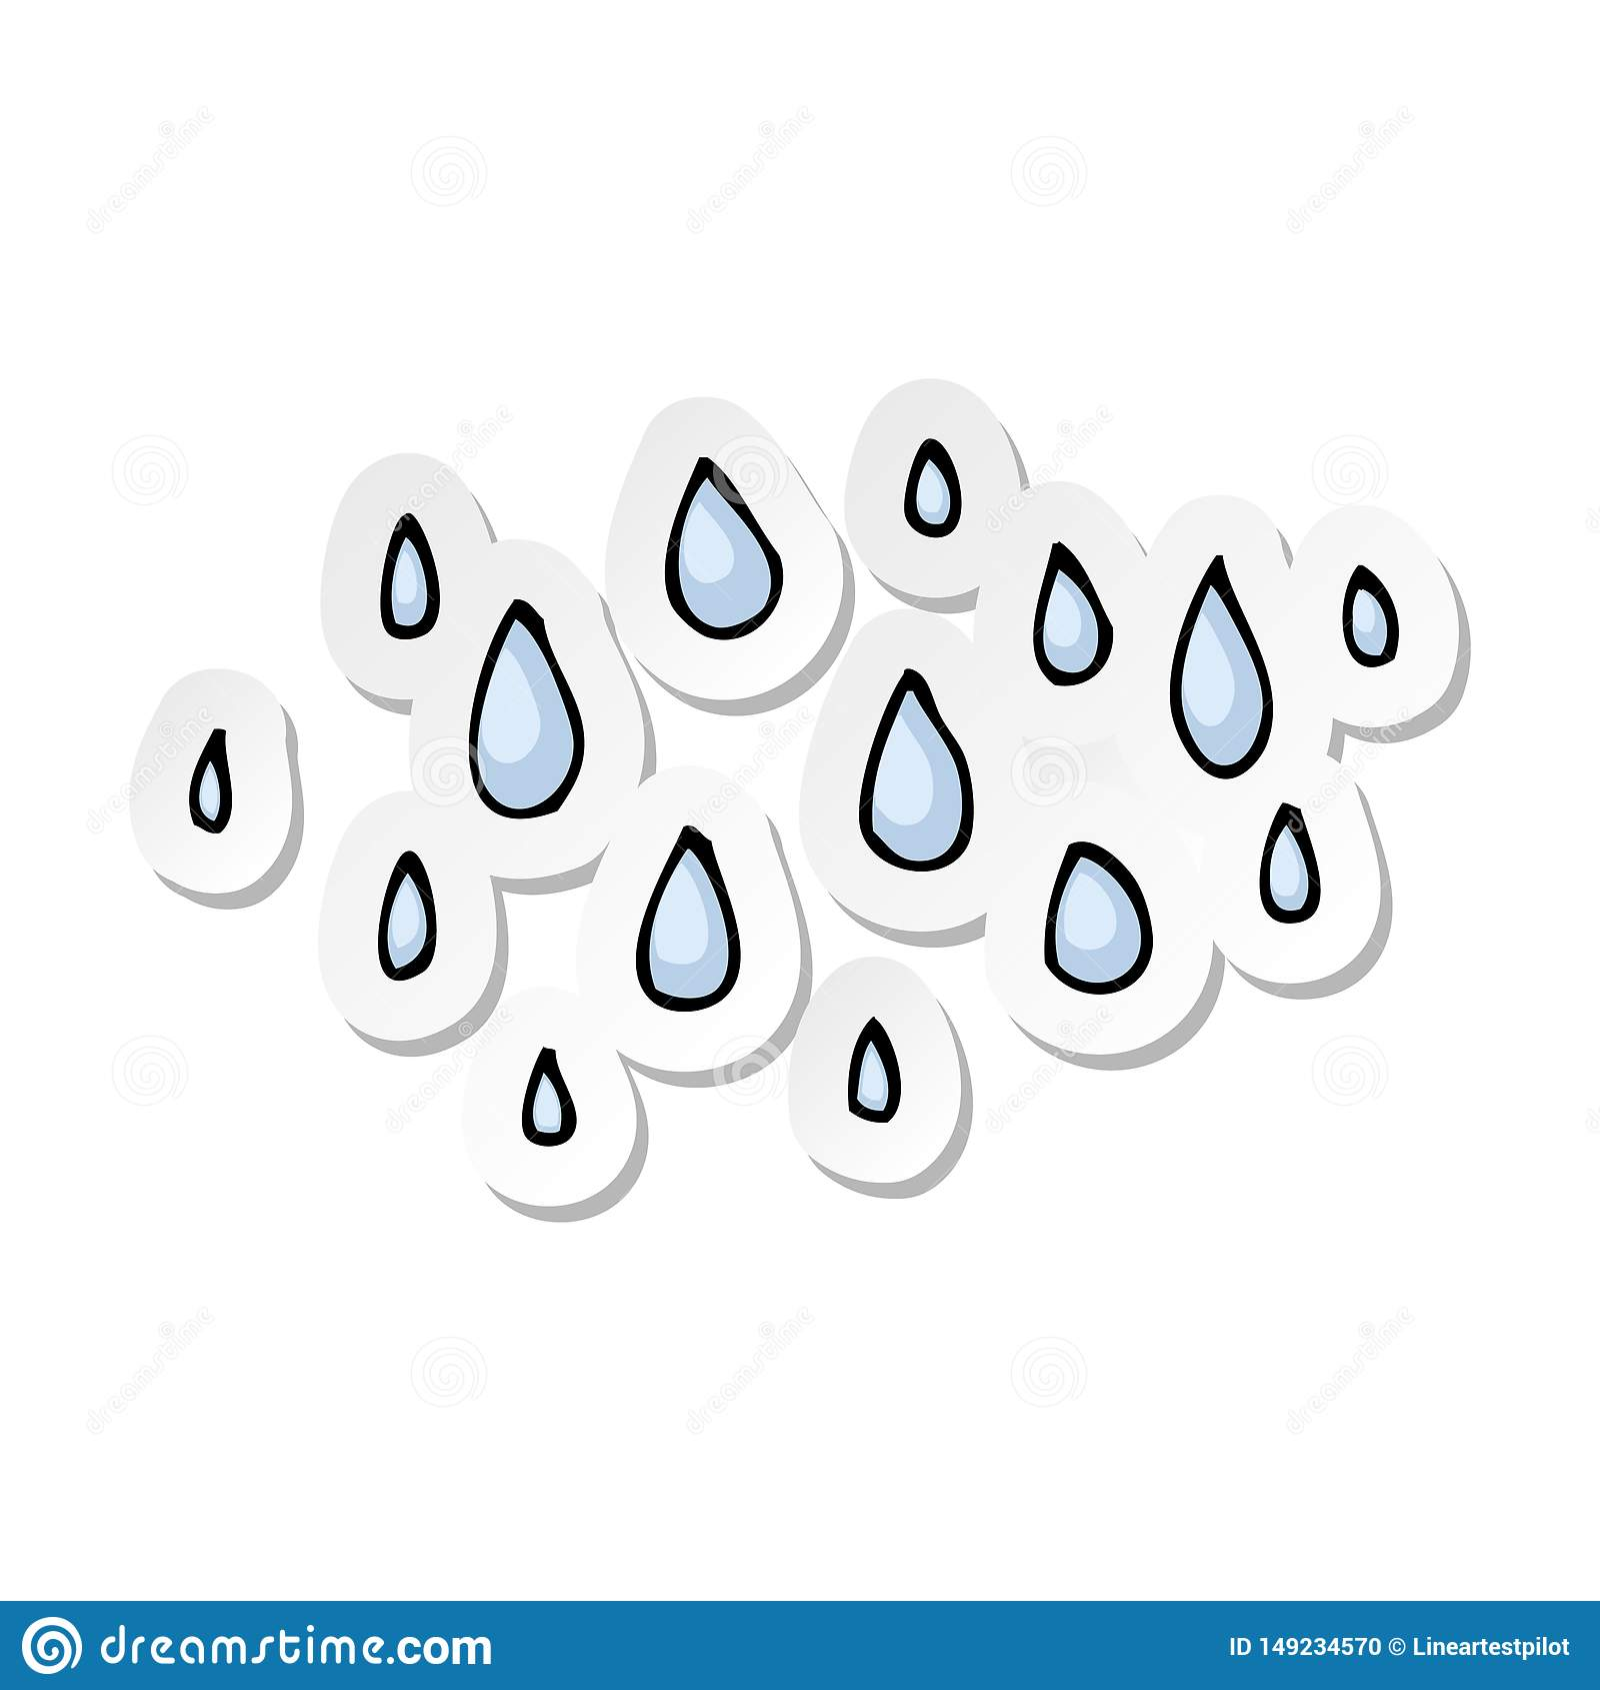 Etiqueta de pingos de chuva de uns desenhos animados